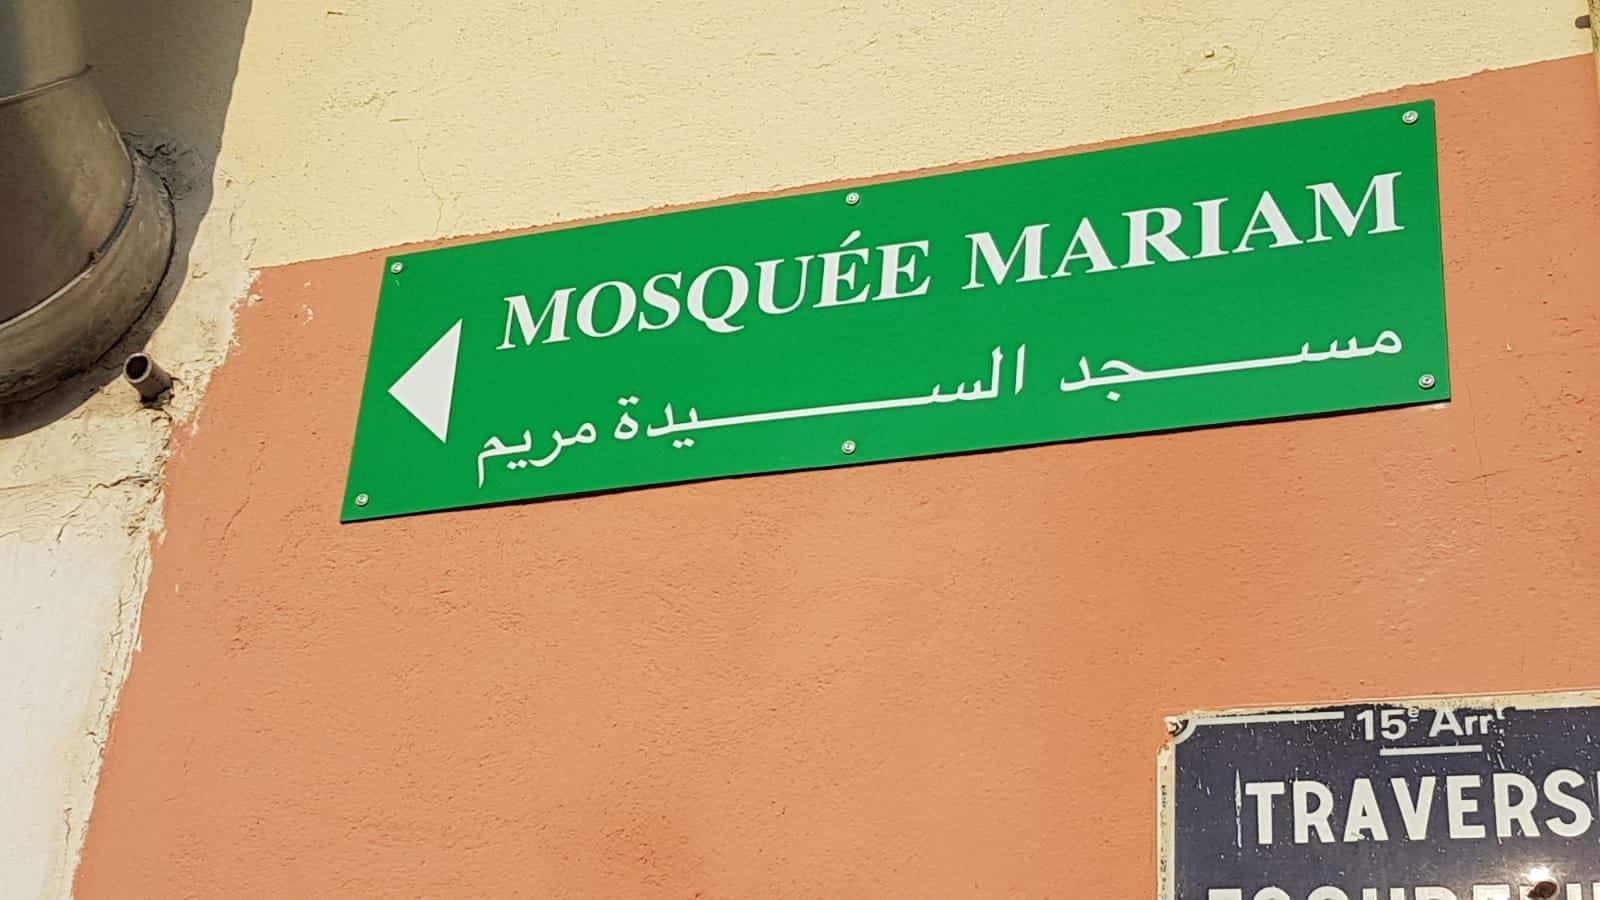 Centre Musulman de Marseille mosquée Mariam 2